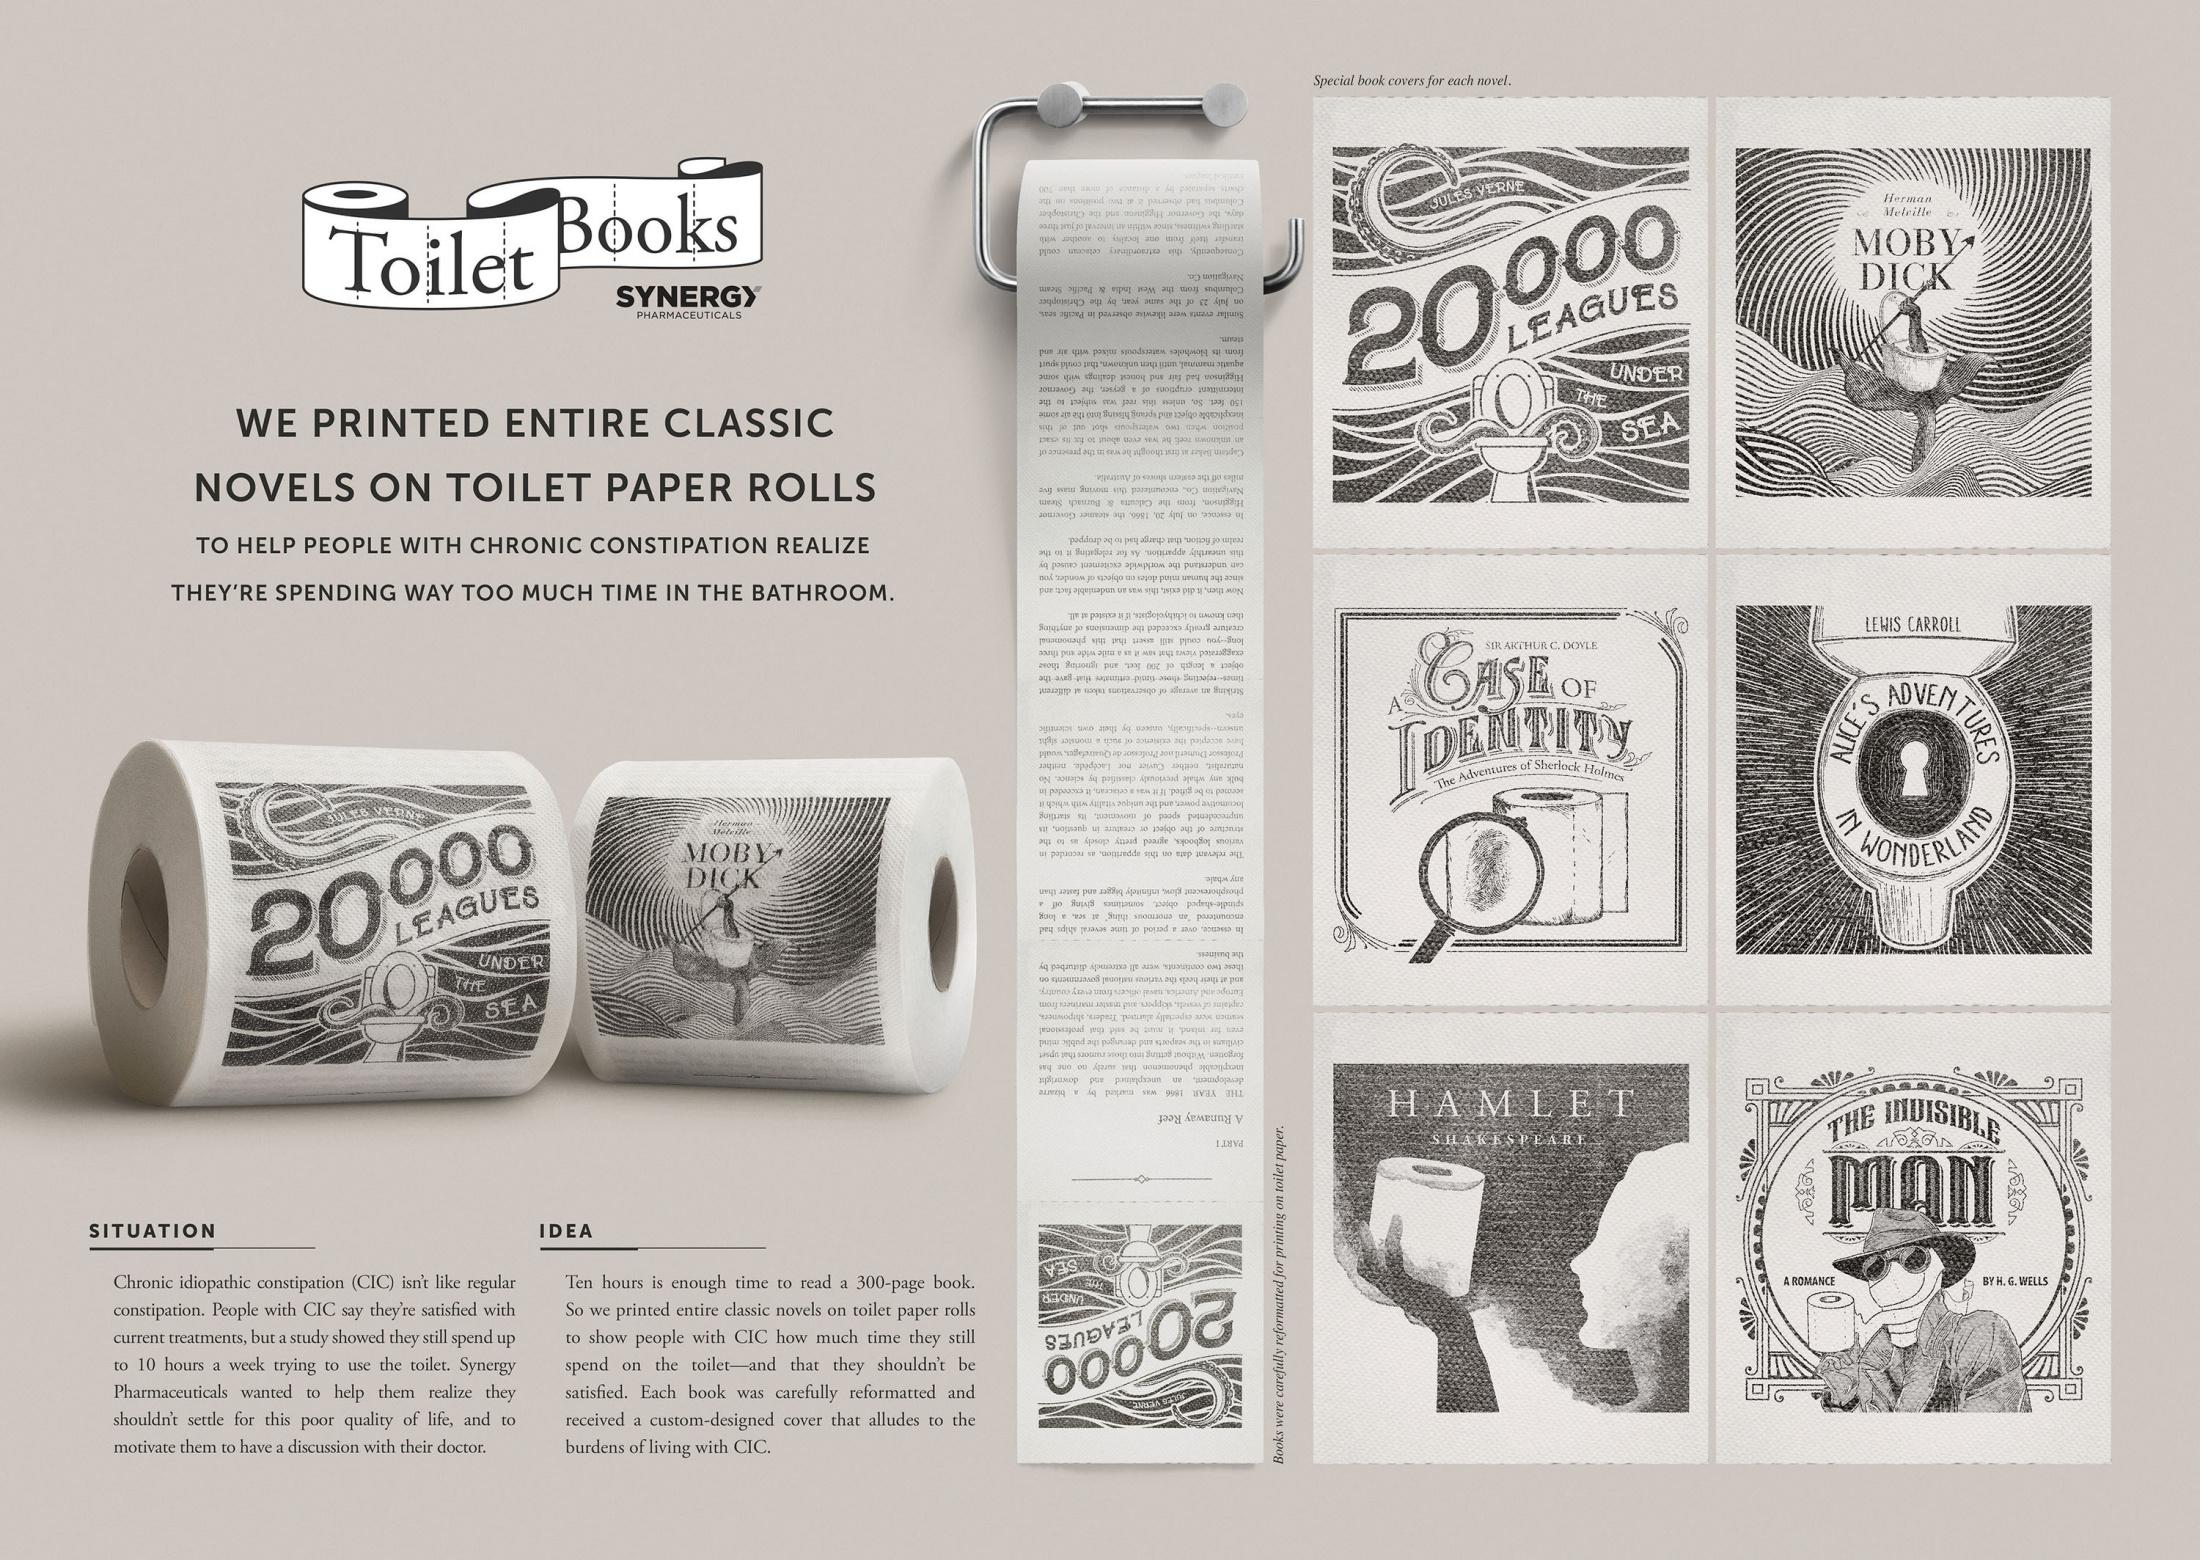 Toilet Books Thumbnail